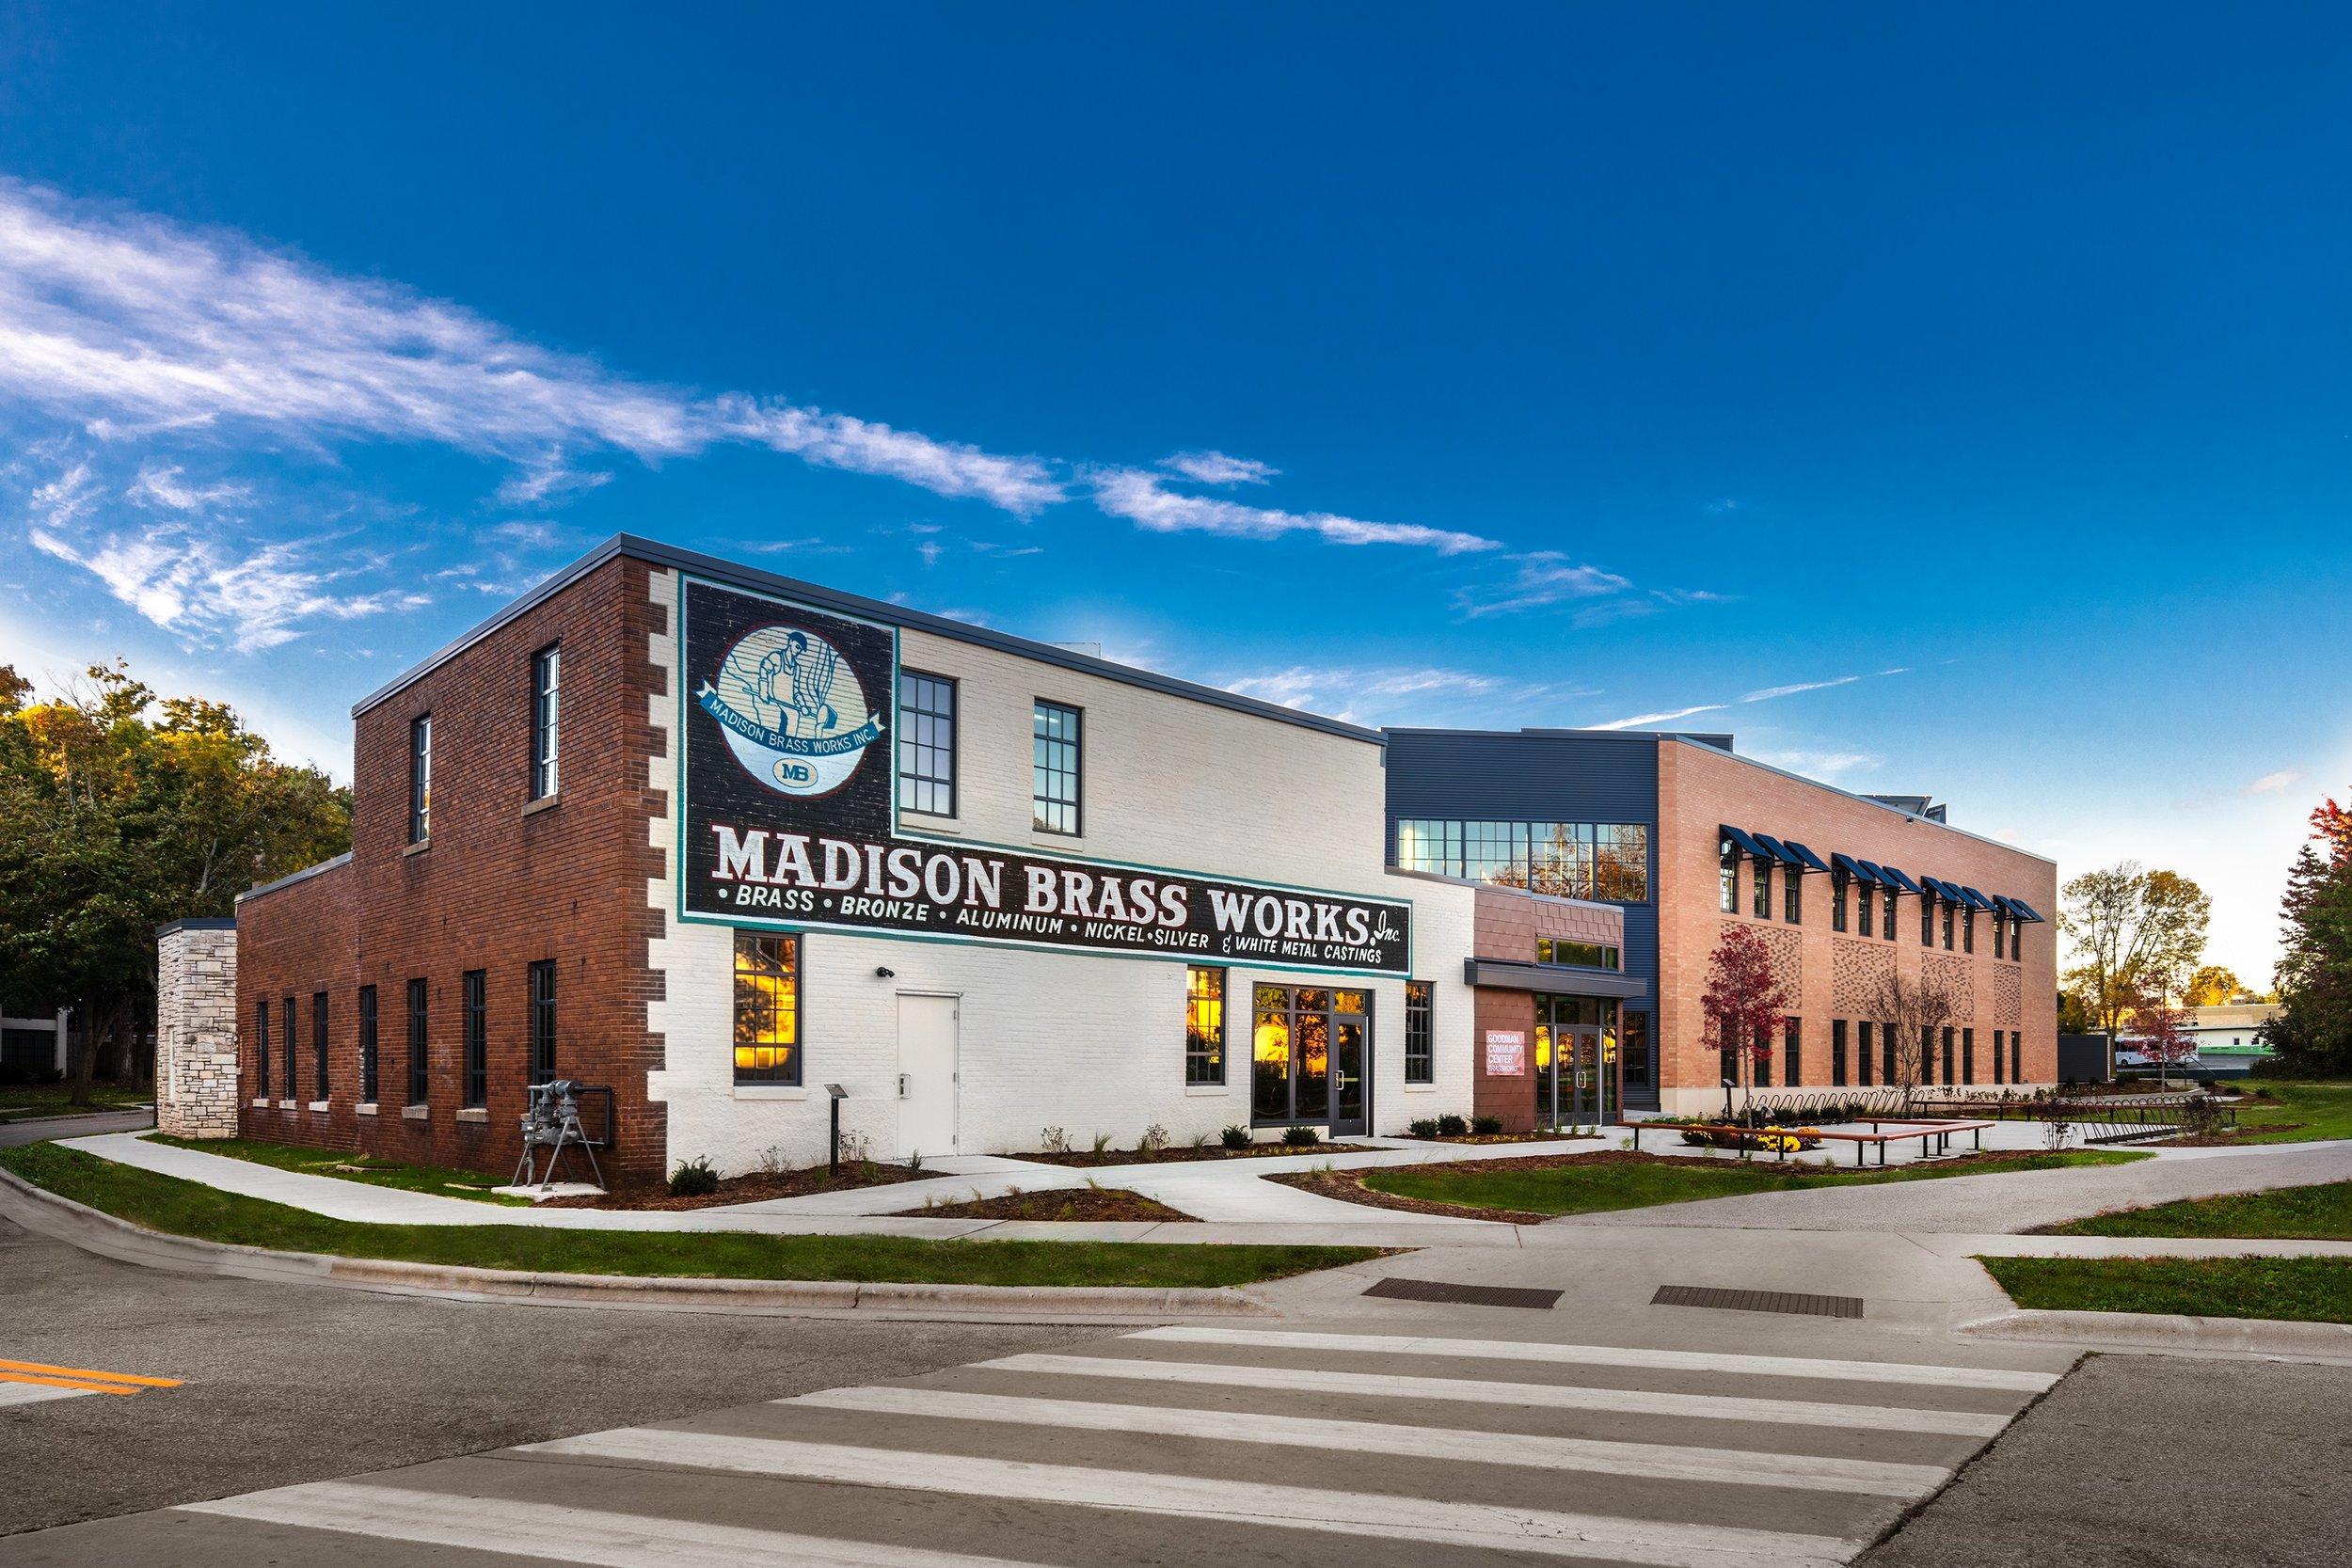 Goodman Community Center - Brass Works